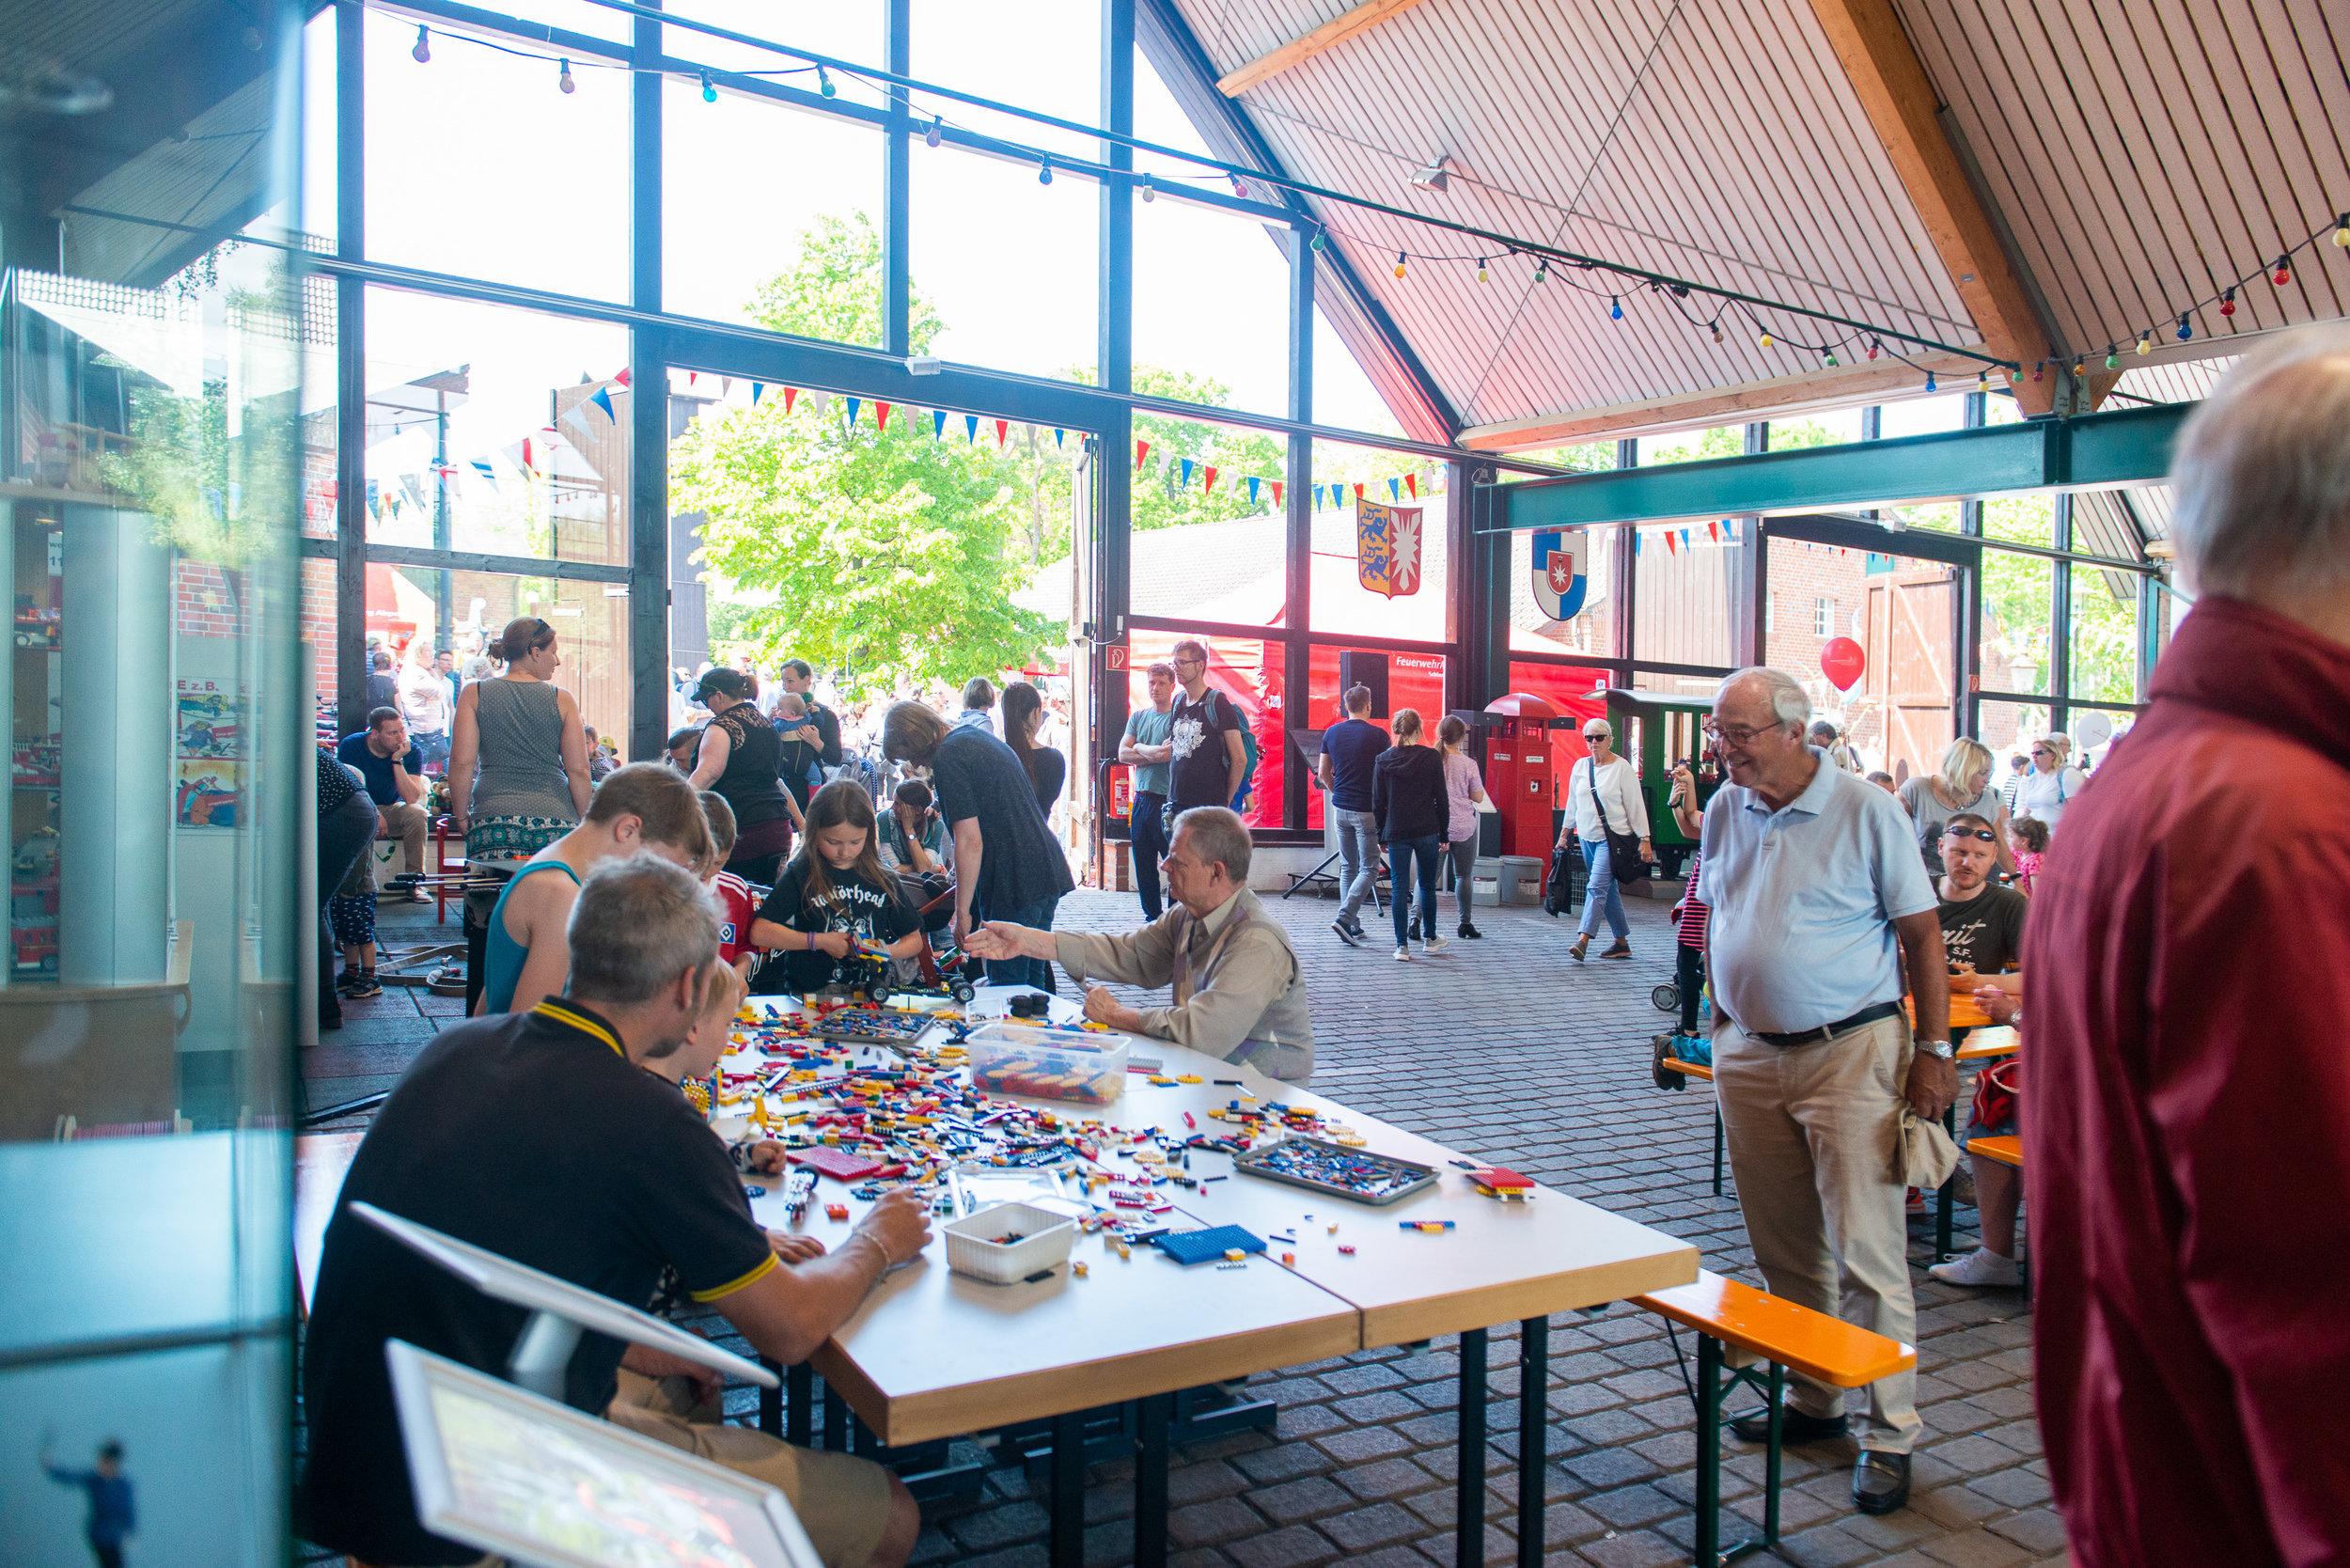 13-Norderstedter-Museumsfest-2019-FWM--XO-Dennys-Mamero-WEB-1.jpg